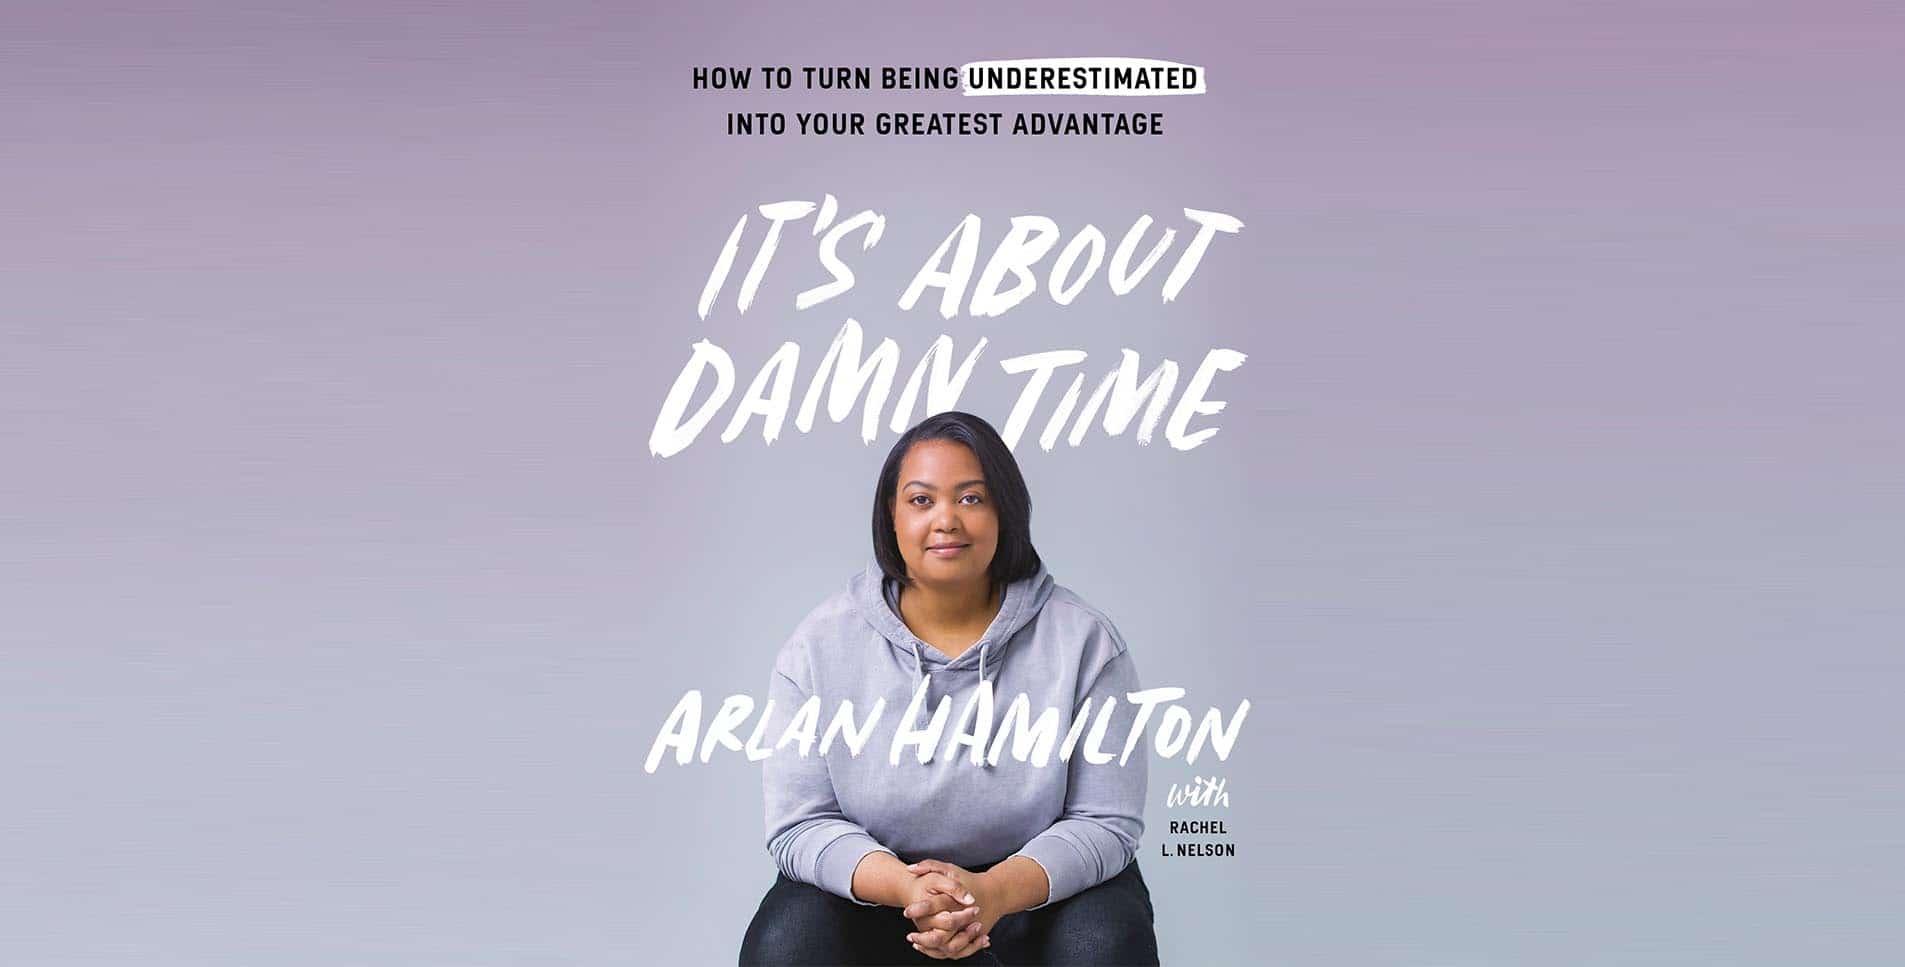 https://gravityspeakers.com/wp-content/uploads/Arlan-Hamilton-Home-Slider-Book-Cover-Its-About-Damn-Time.jpg